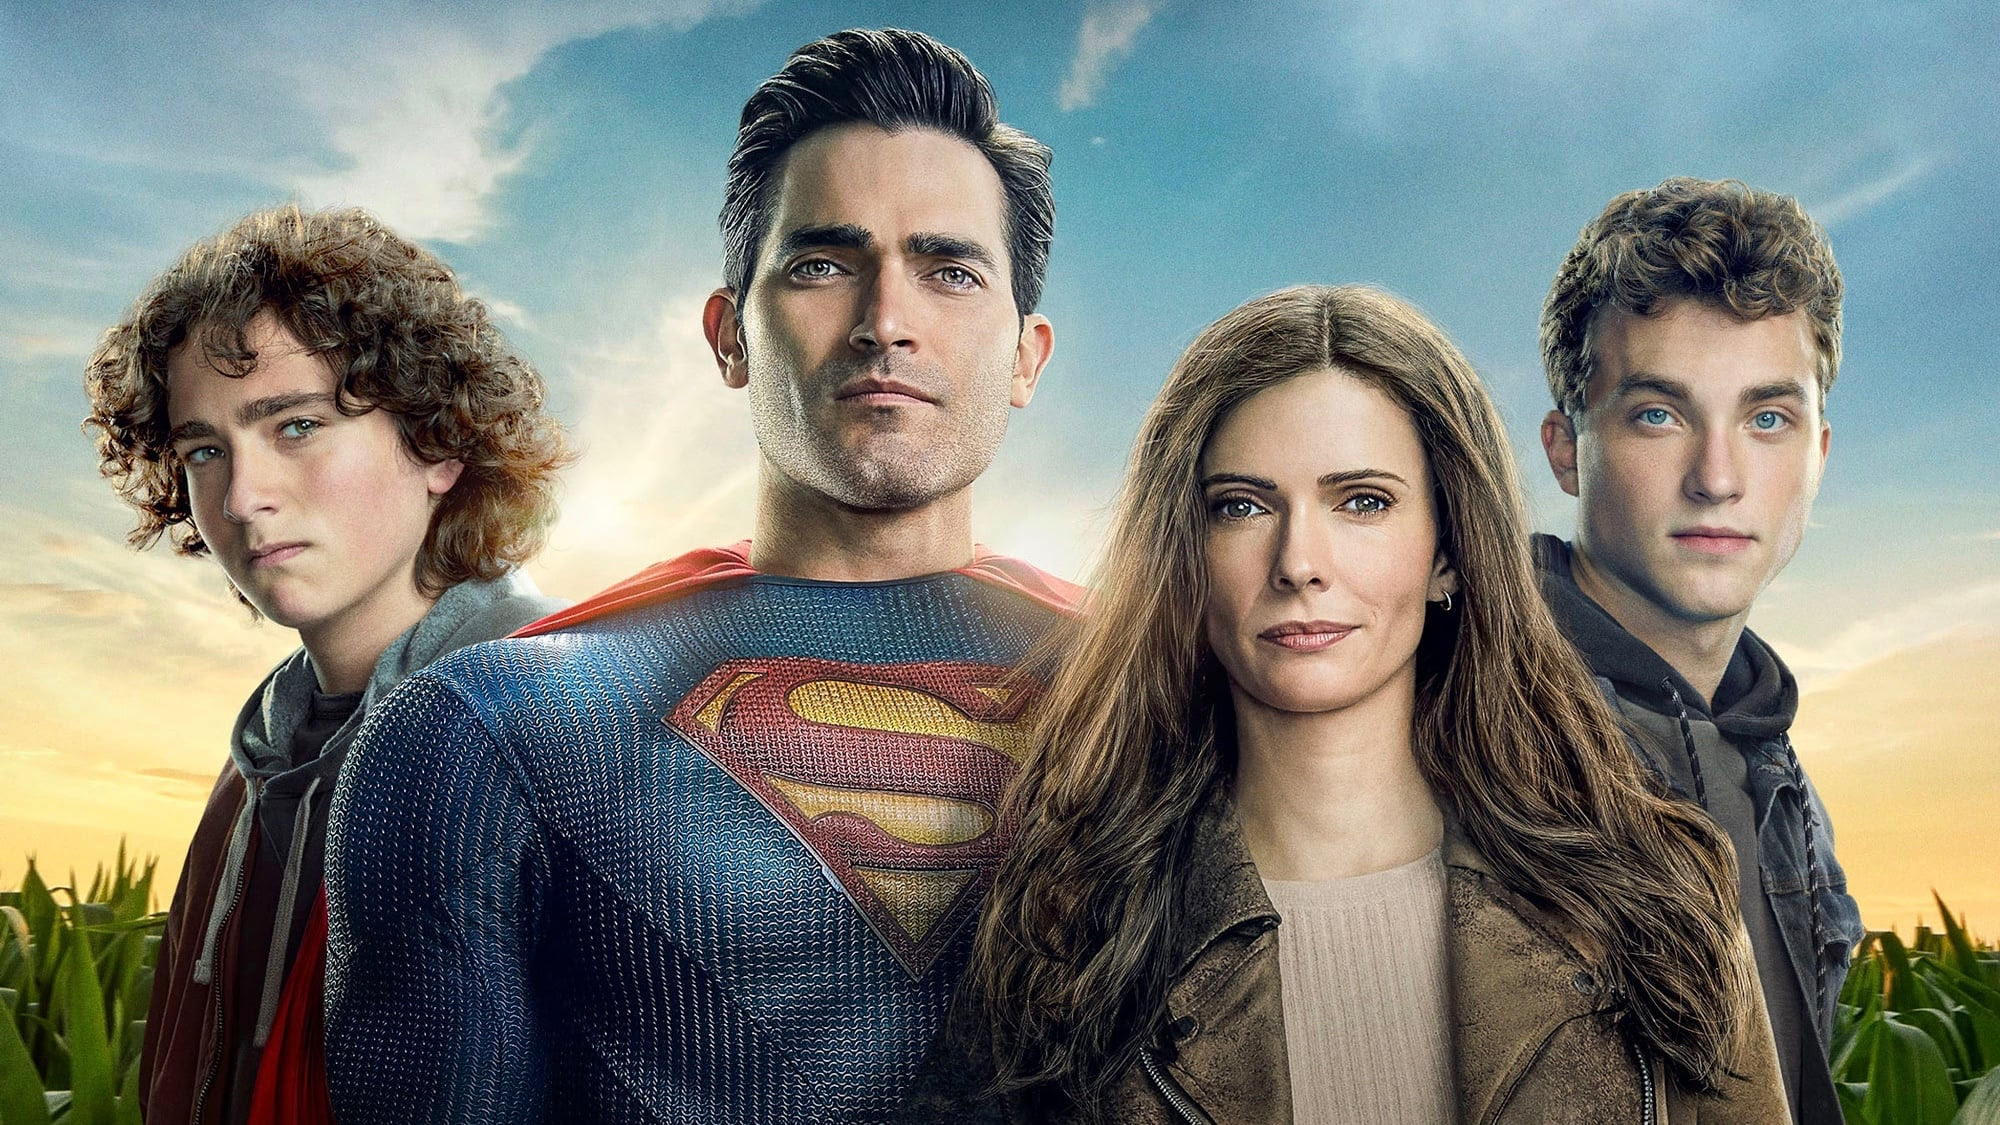 Superman & Lois S1E9